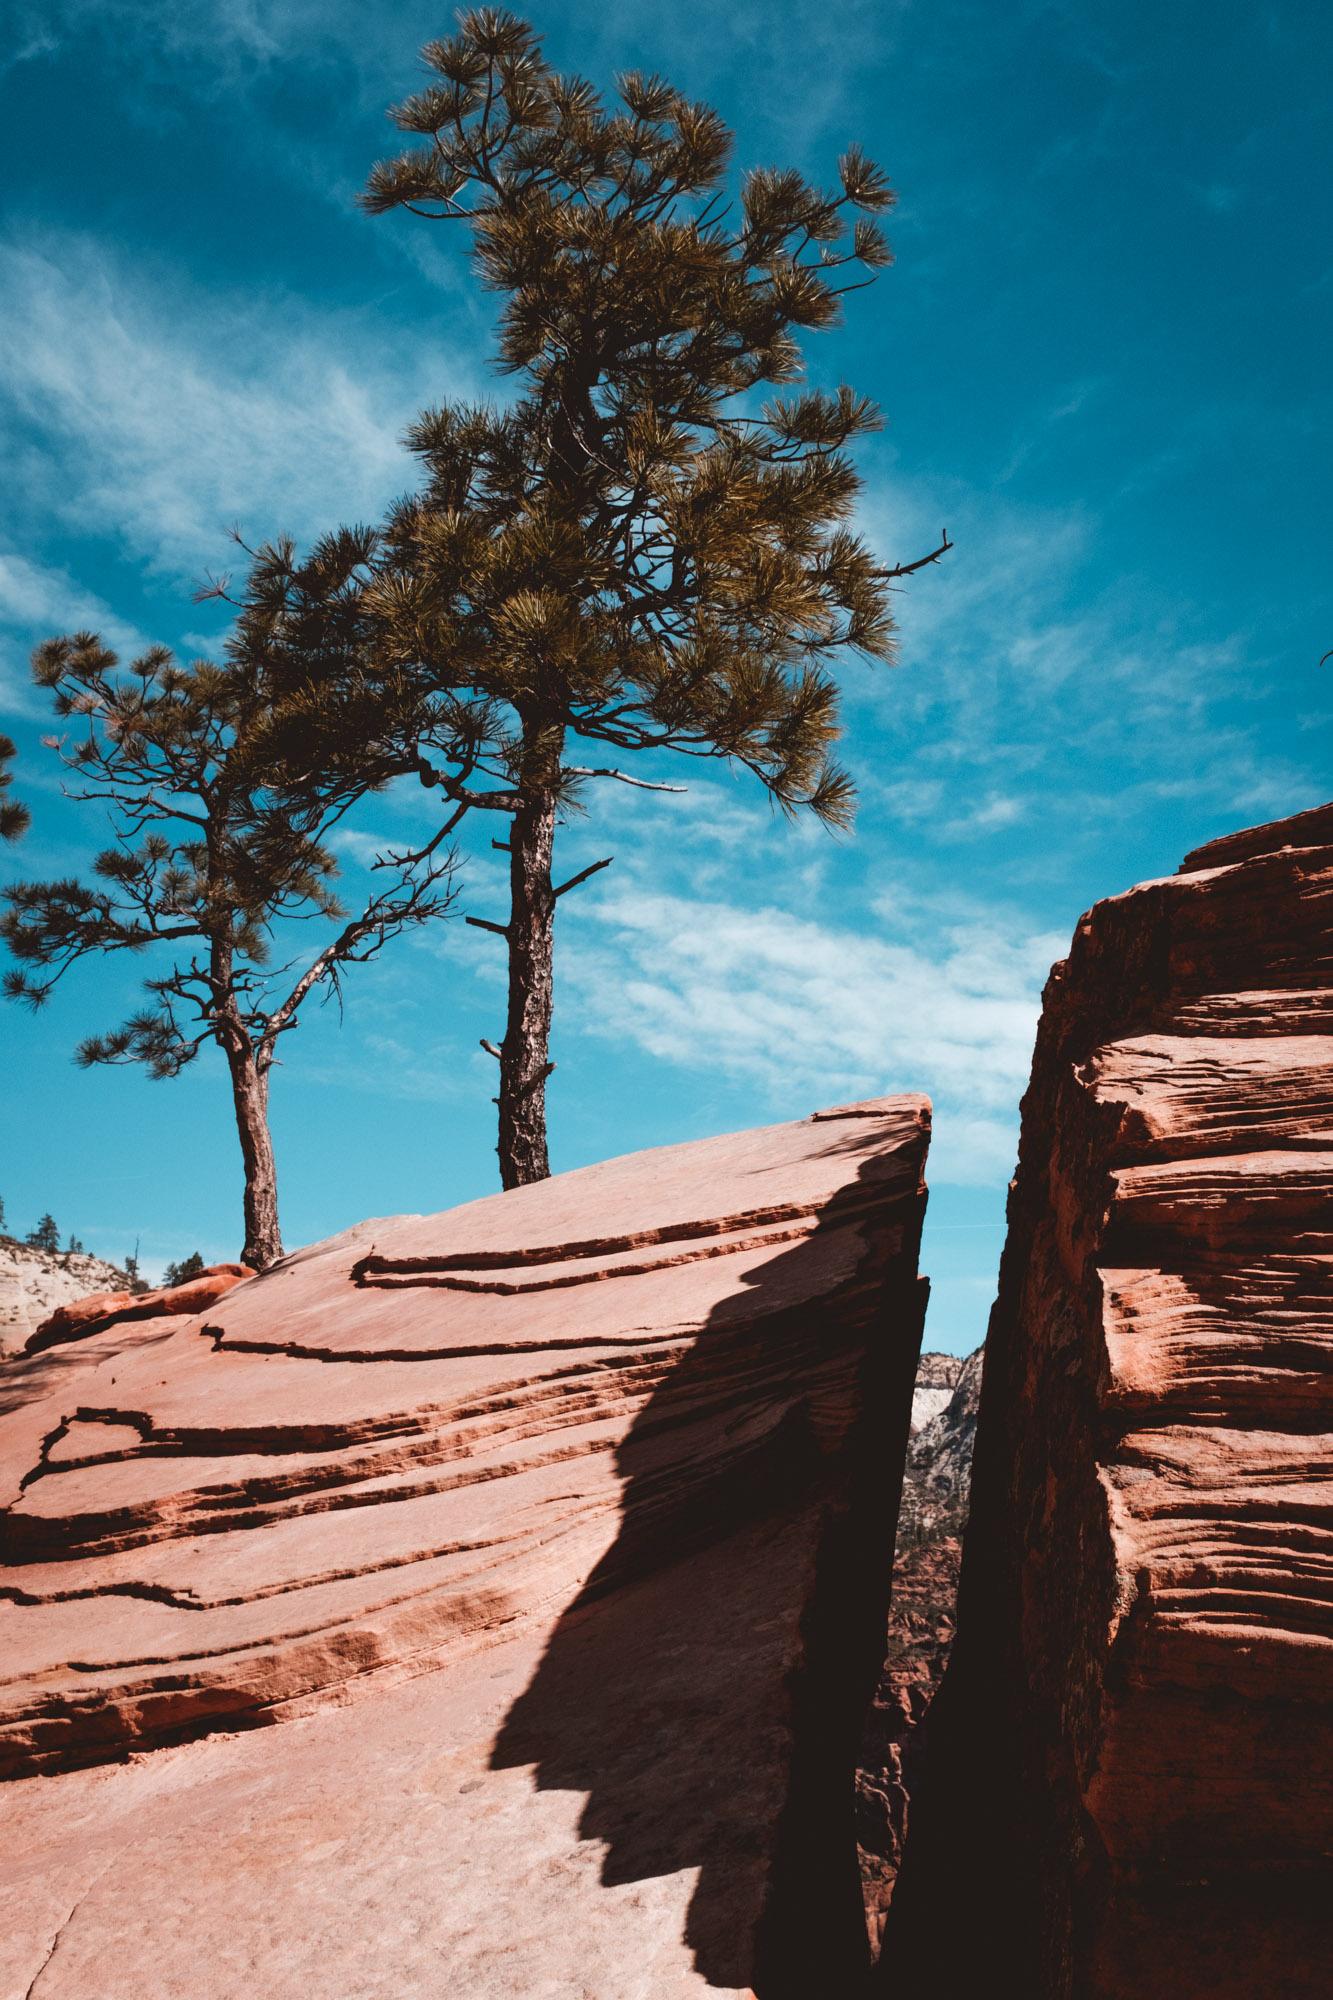 trees-rock-zion-national-park-utah